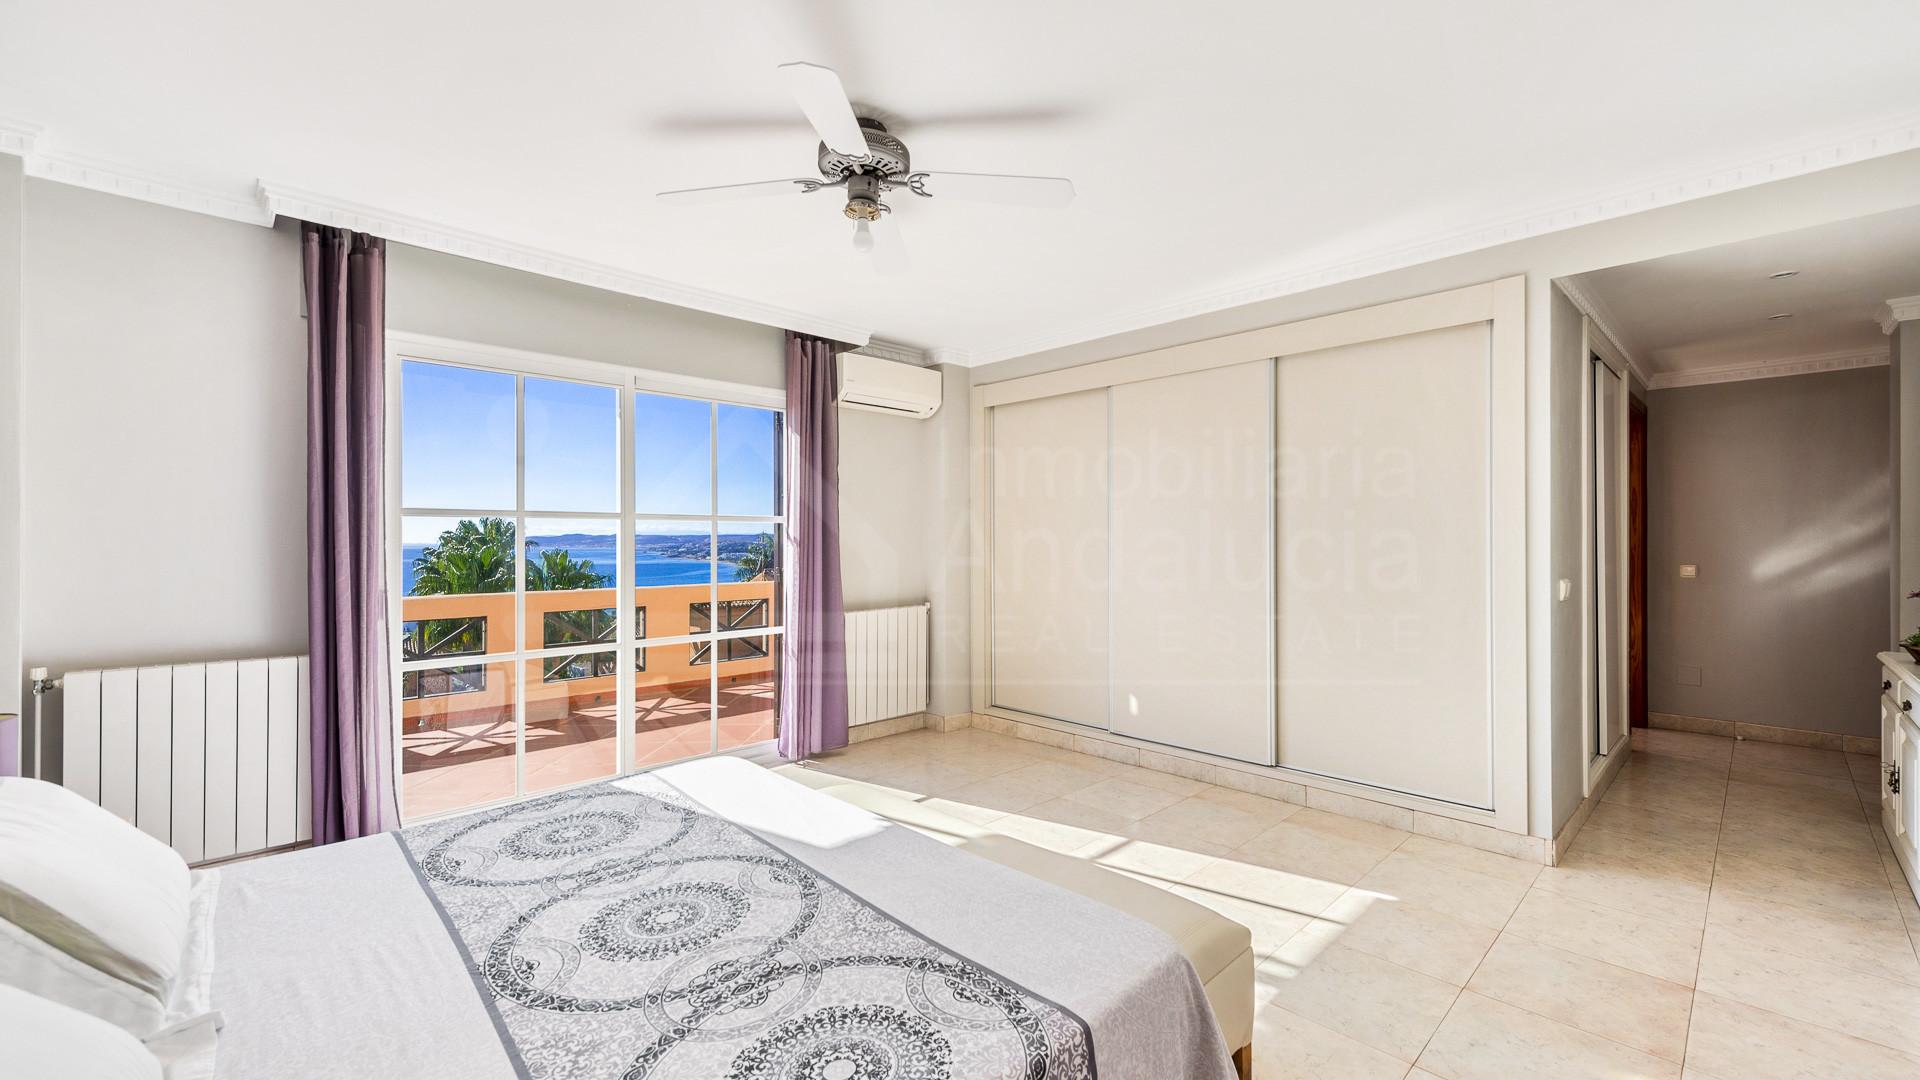 Villa with beautiful sea views in Seghers, Estepona